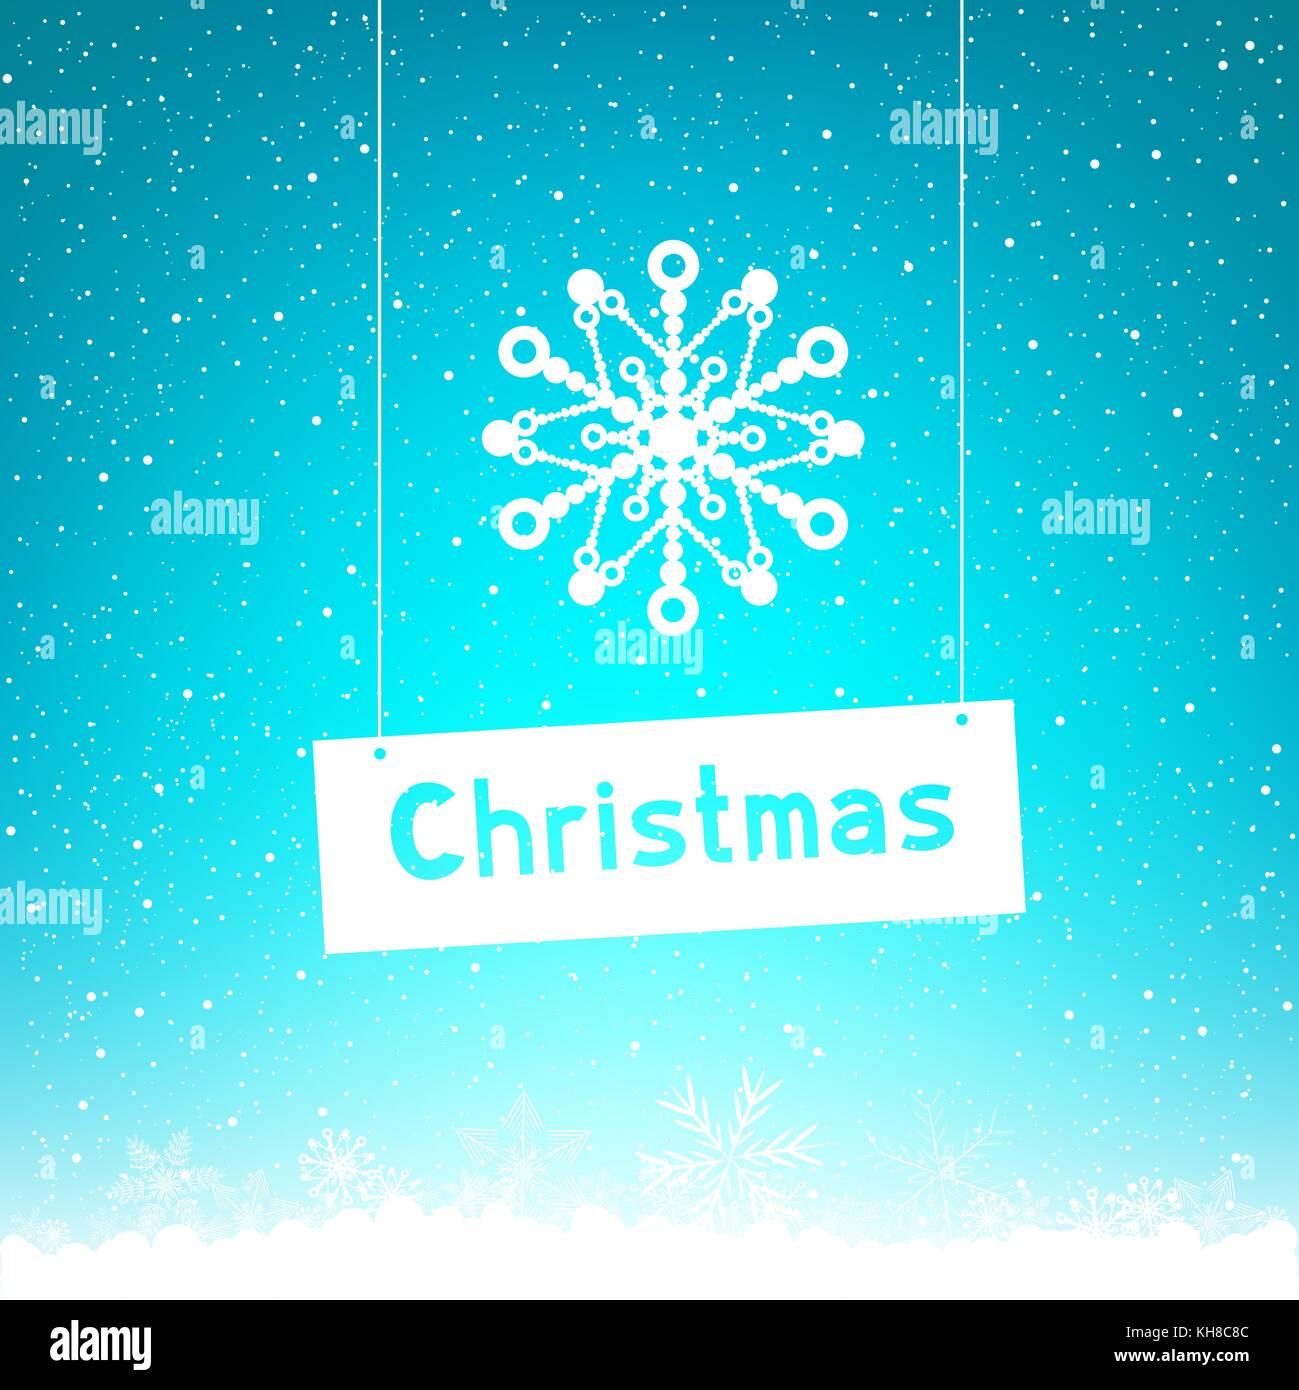 blue winter Christmas text snowflake - Stock Image